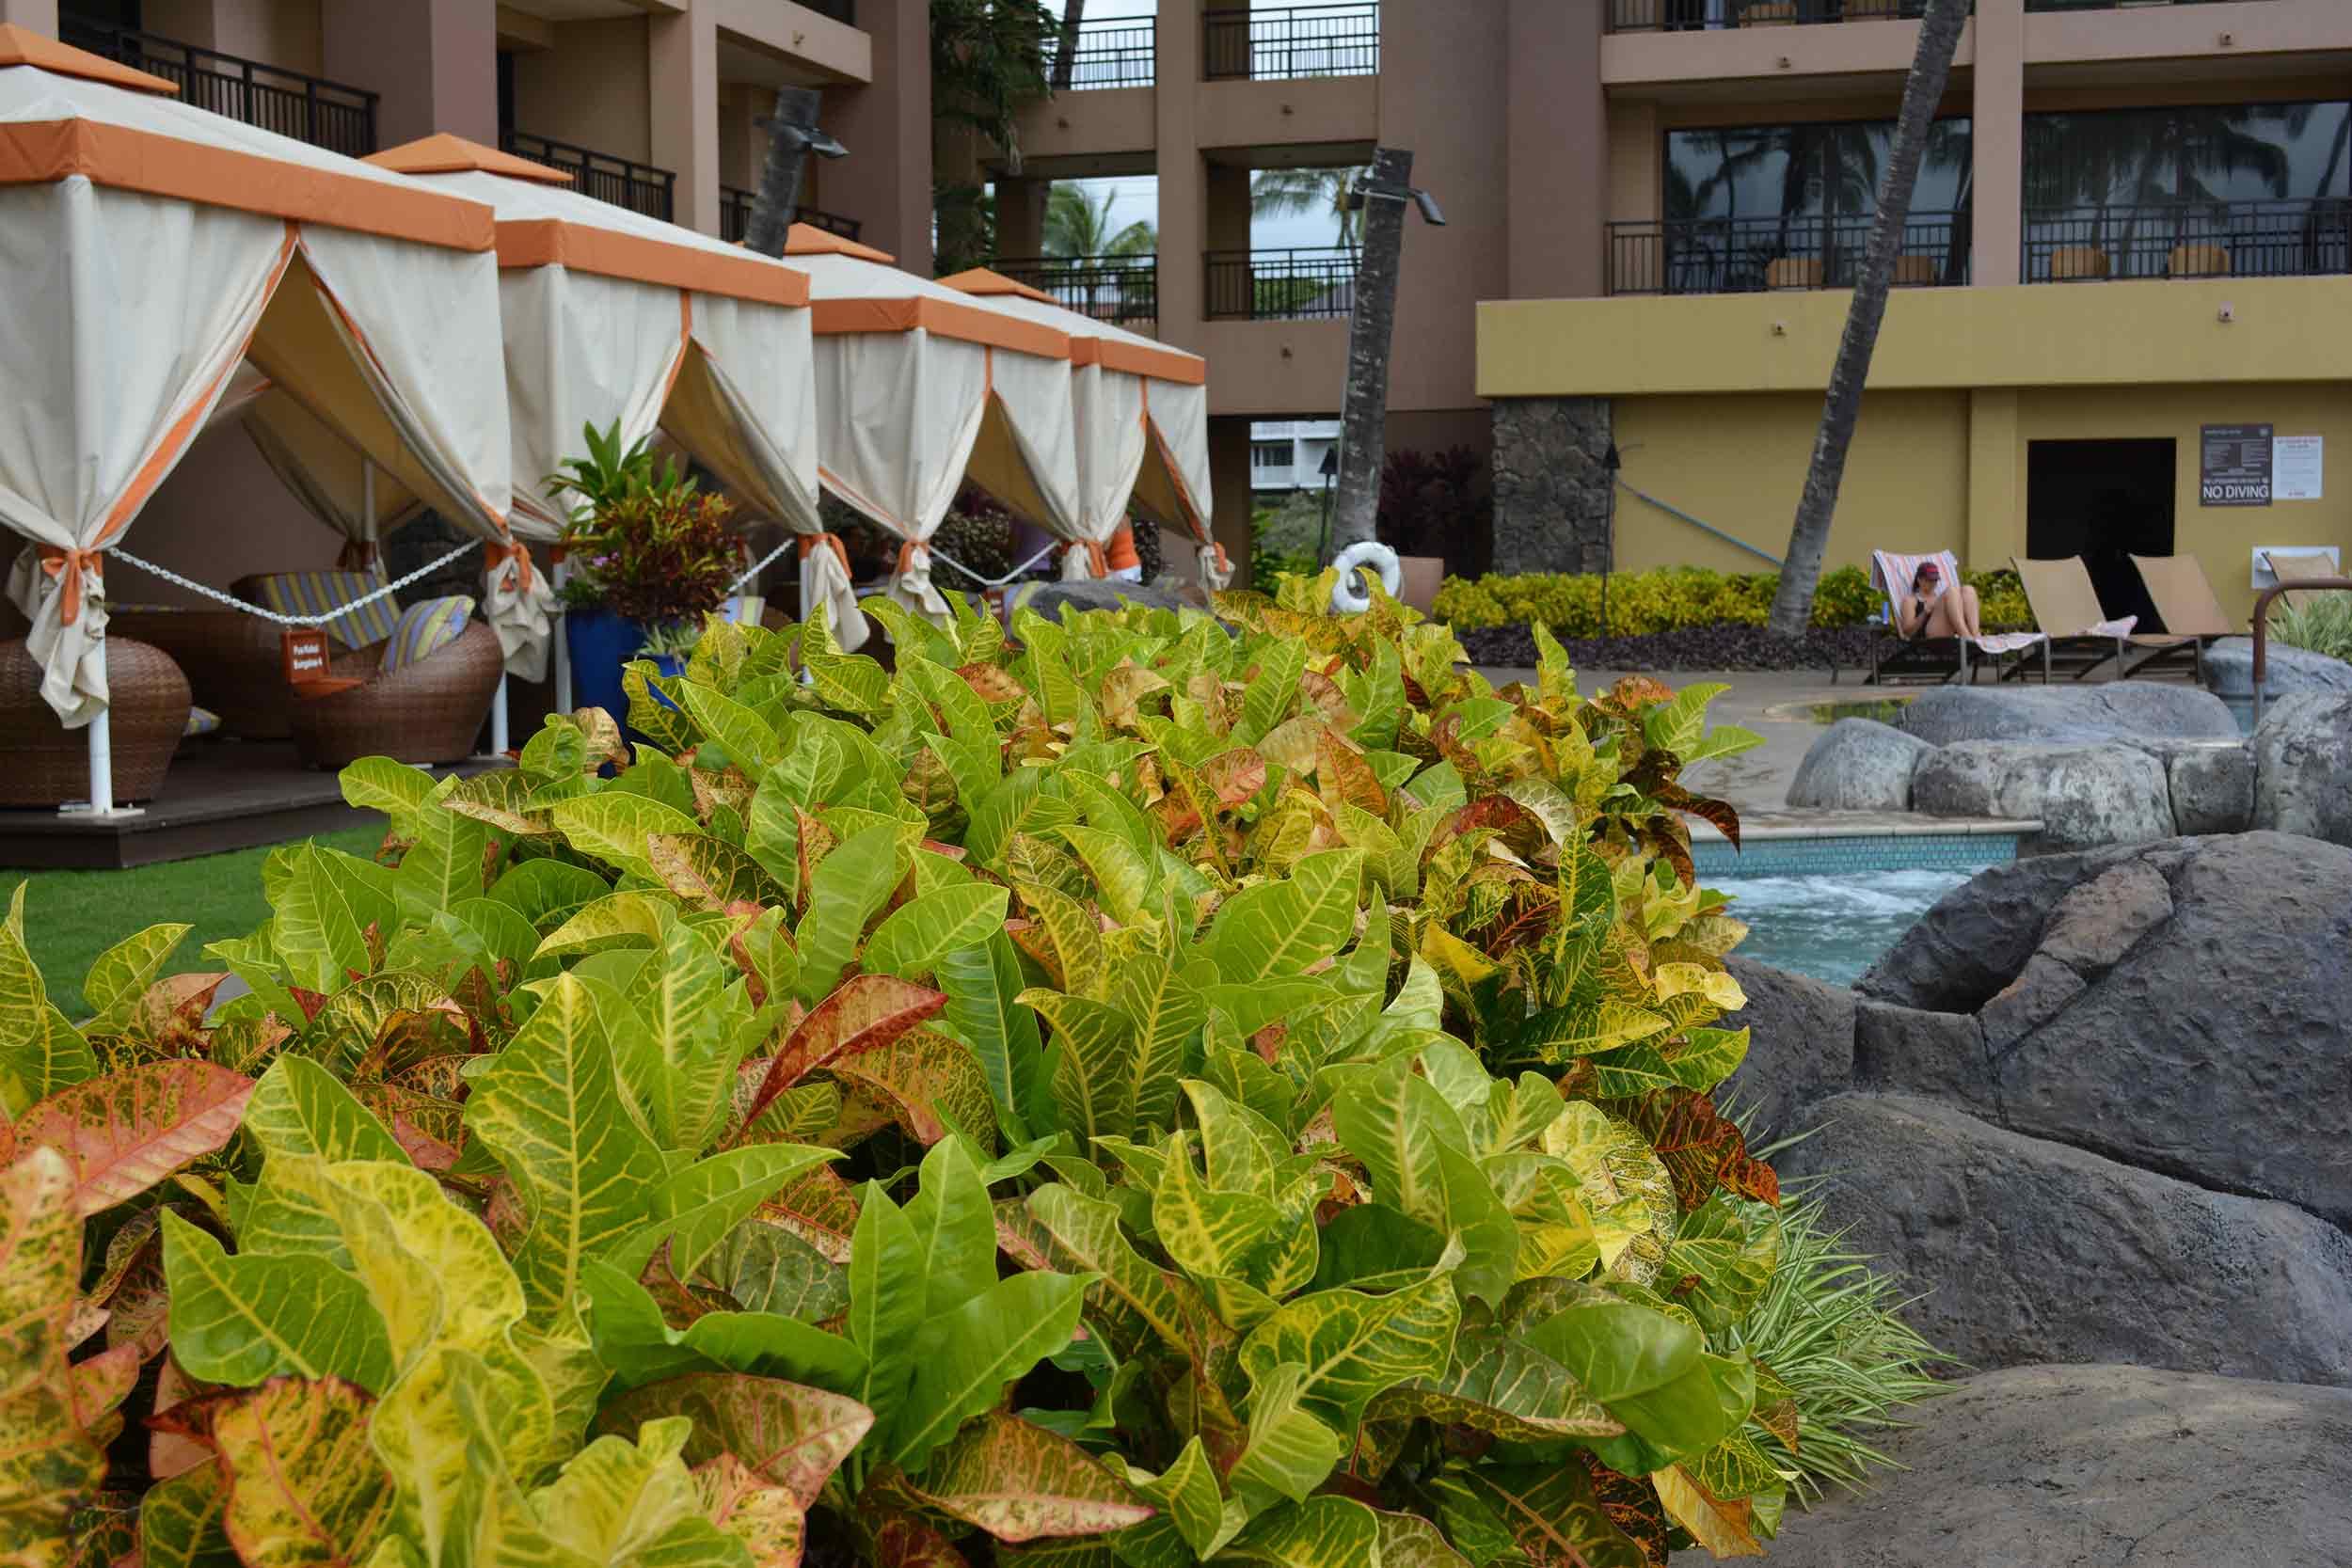 Landscaping for the Sheraton Kauai Resort pool in Koloa Hi